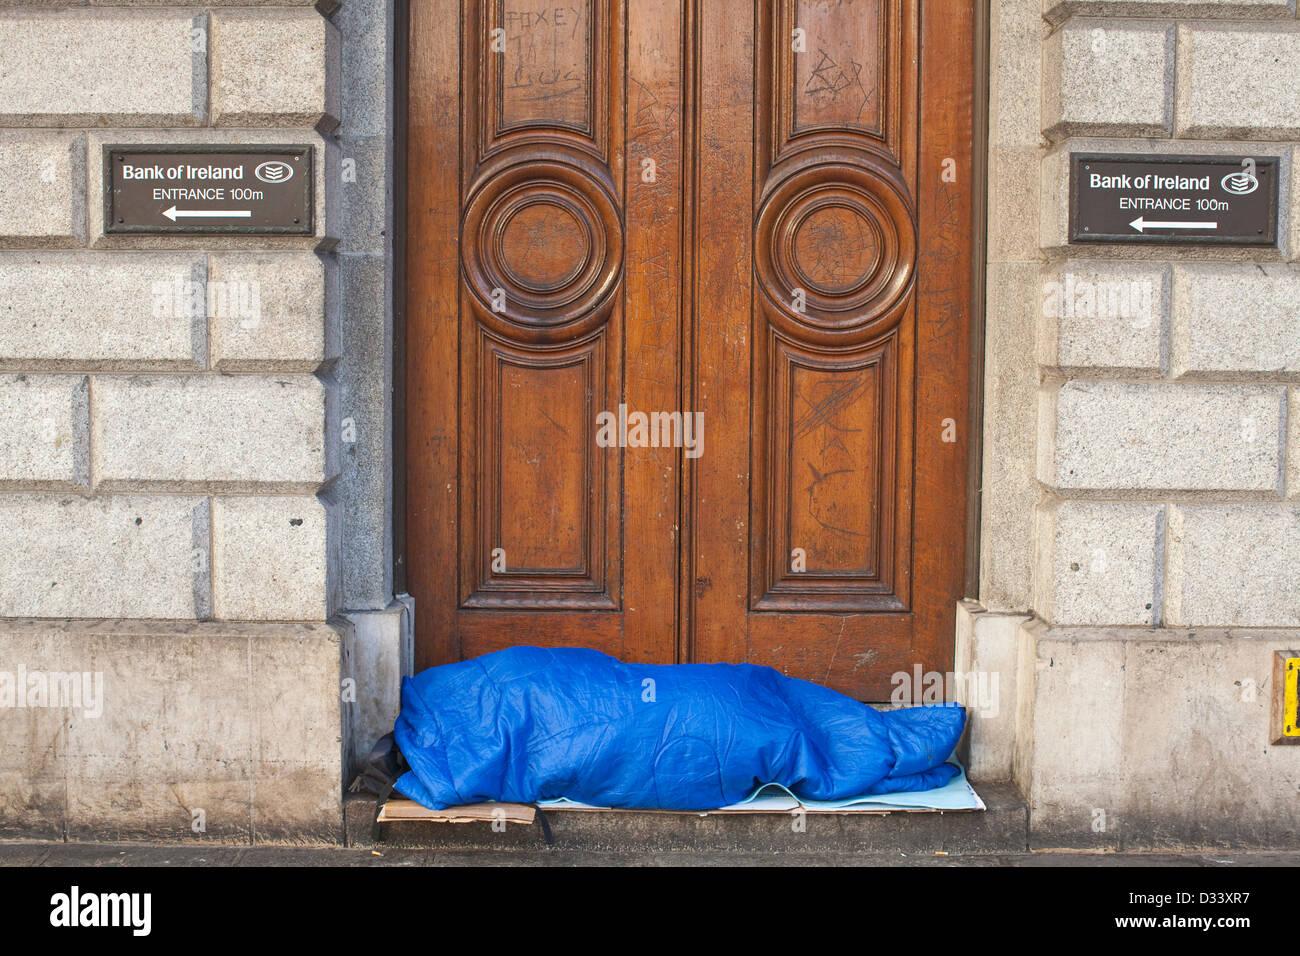 Homeless woman sleeping on the doorstep of the Bank of Ireland, Westmoreland Street, Dublin, Ireland. - Stock Image